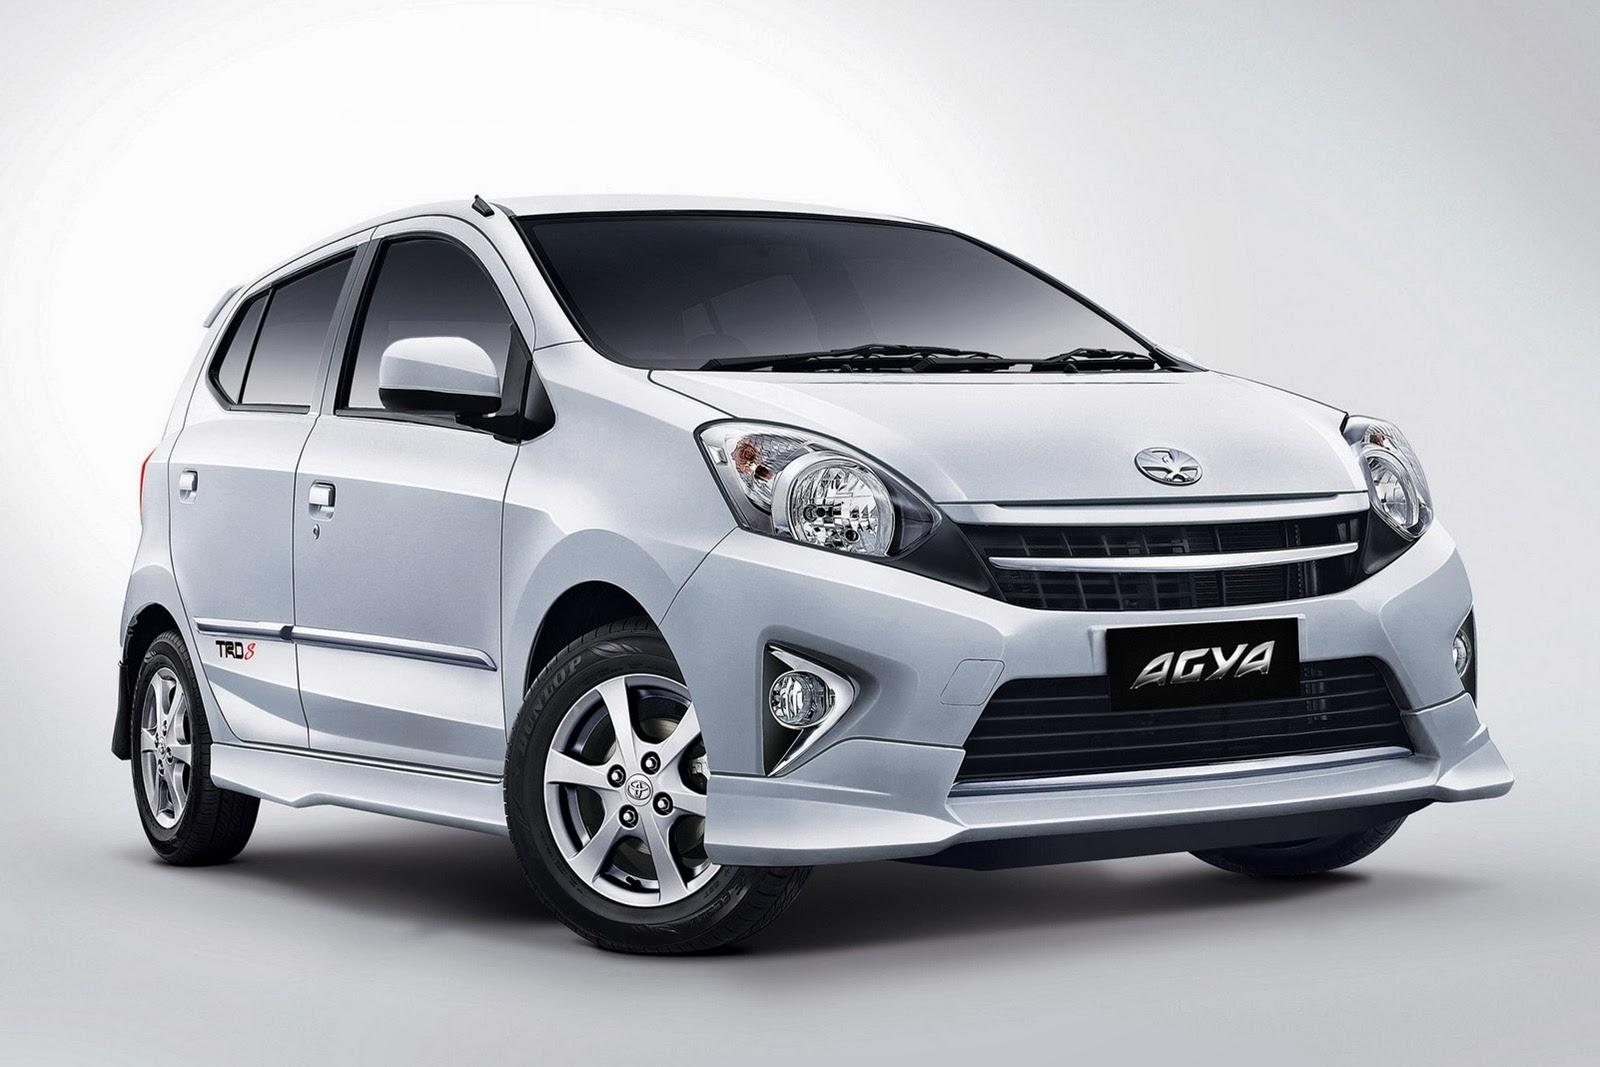 Harga New Agya Trd 2017 Cutting Sticker Grand Avanza Spesifikasi Mobil Toyota Ayla Baru Bekas Second